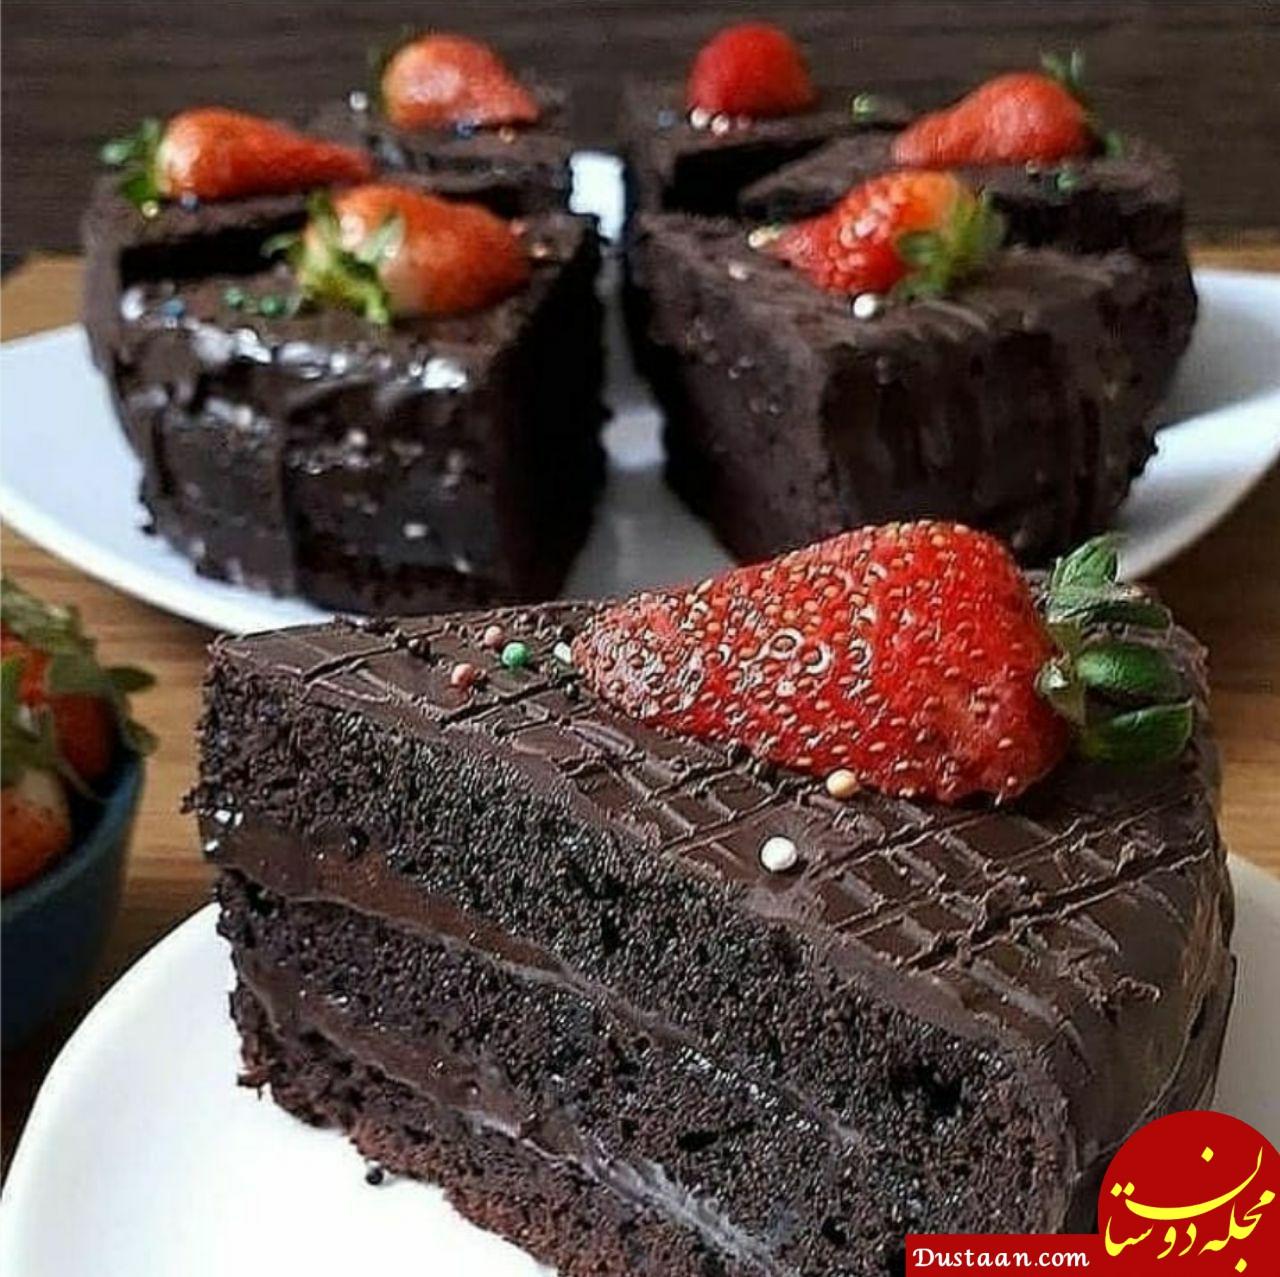 www.dustaan.com طرز تهیه کیک دبل چاکلت ، خوشمزه و متفاوت